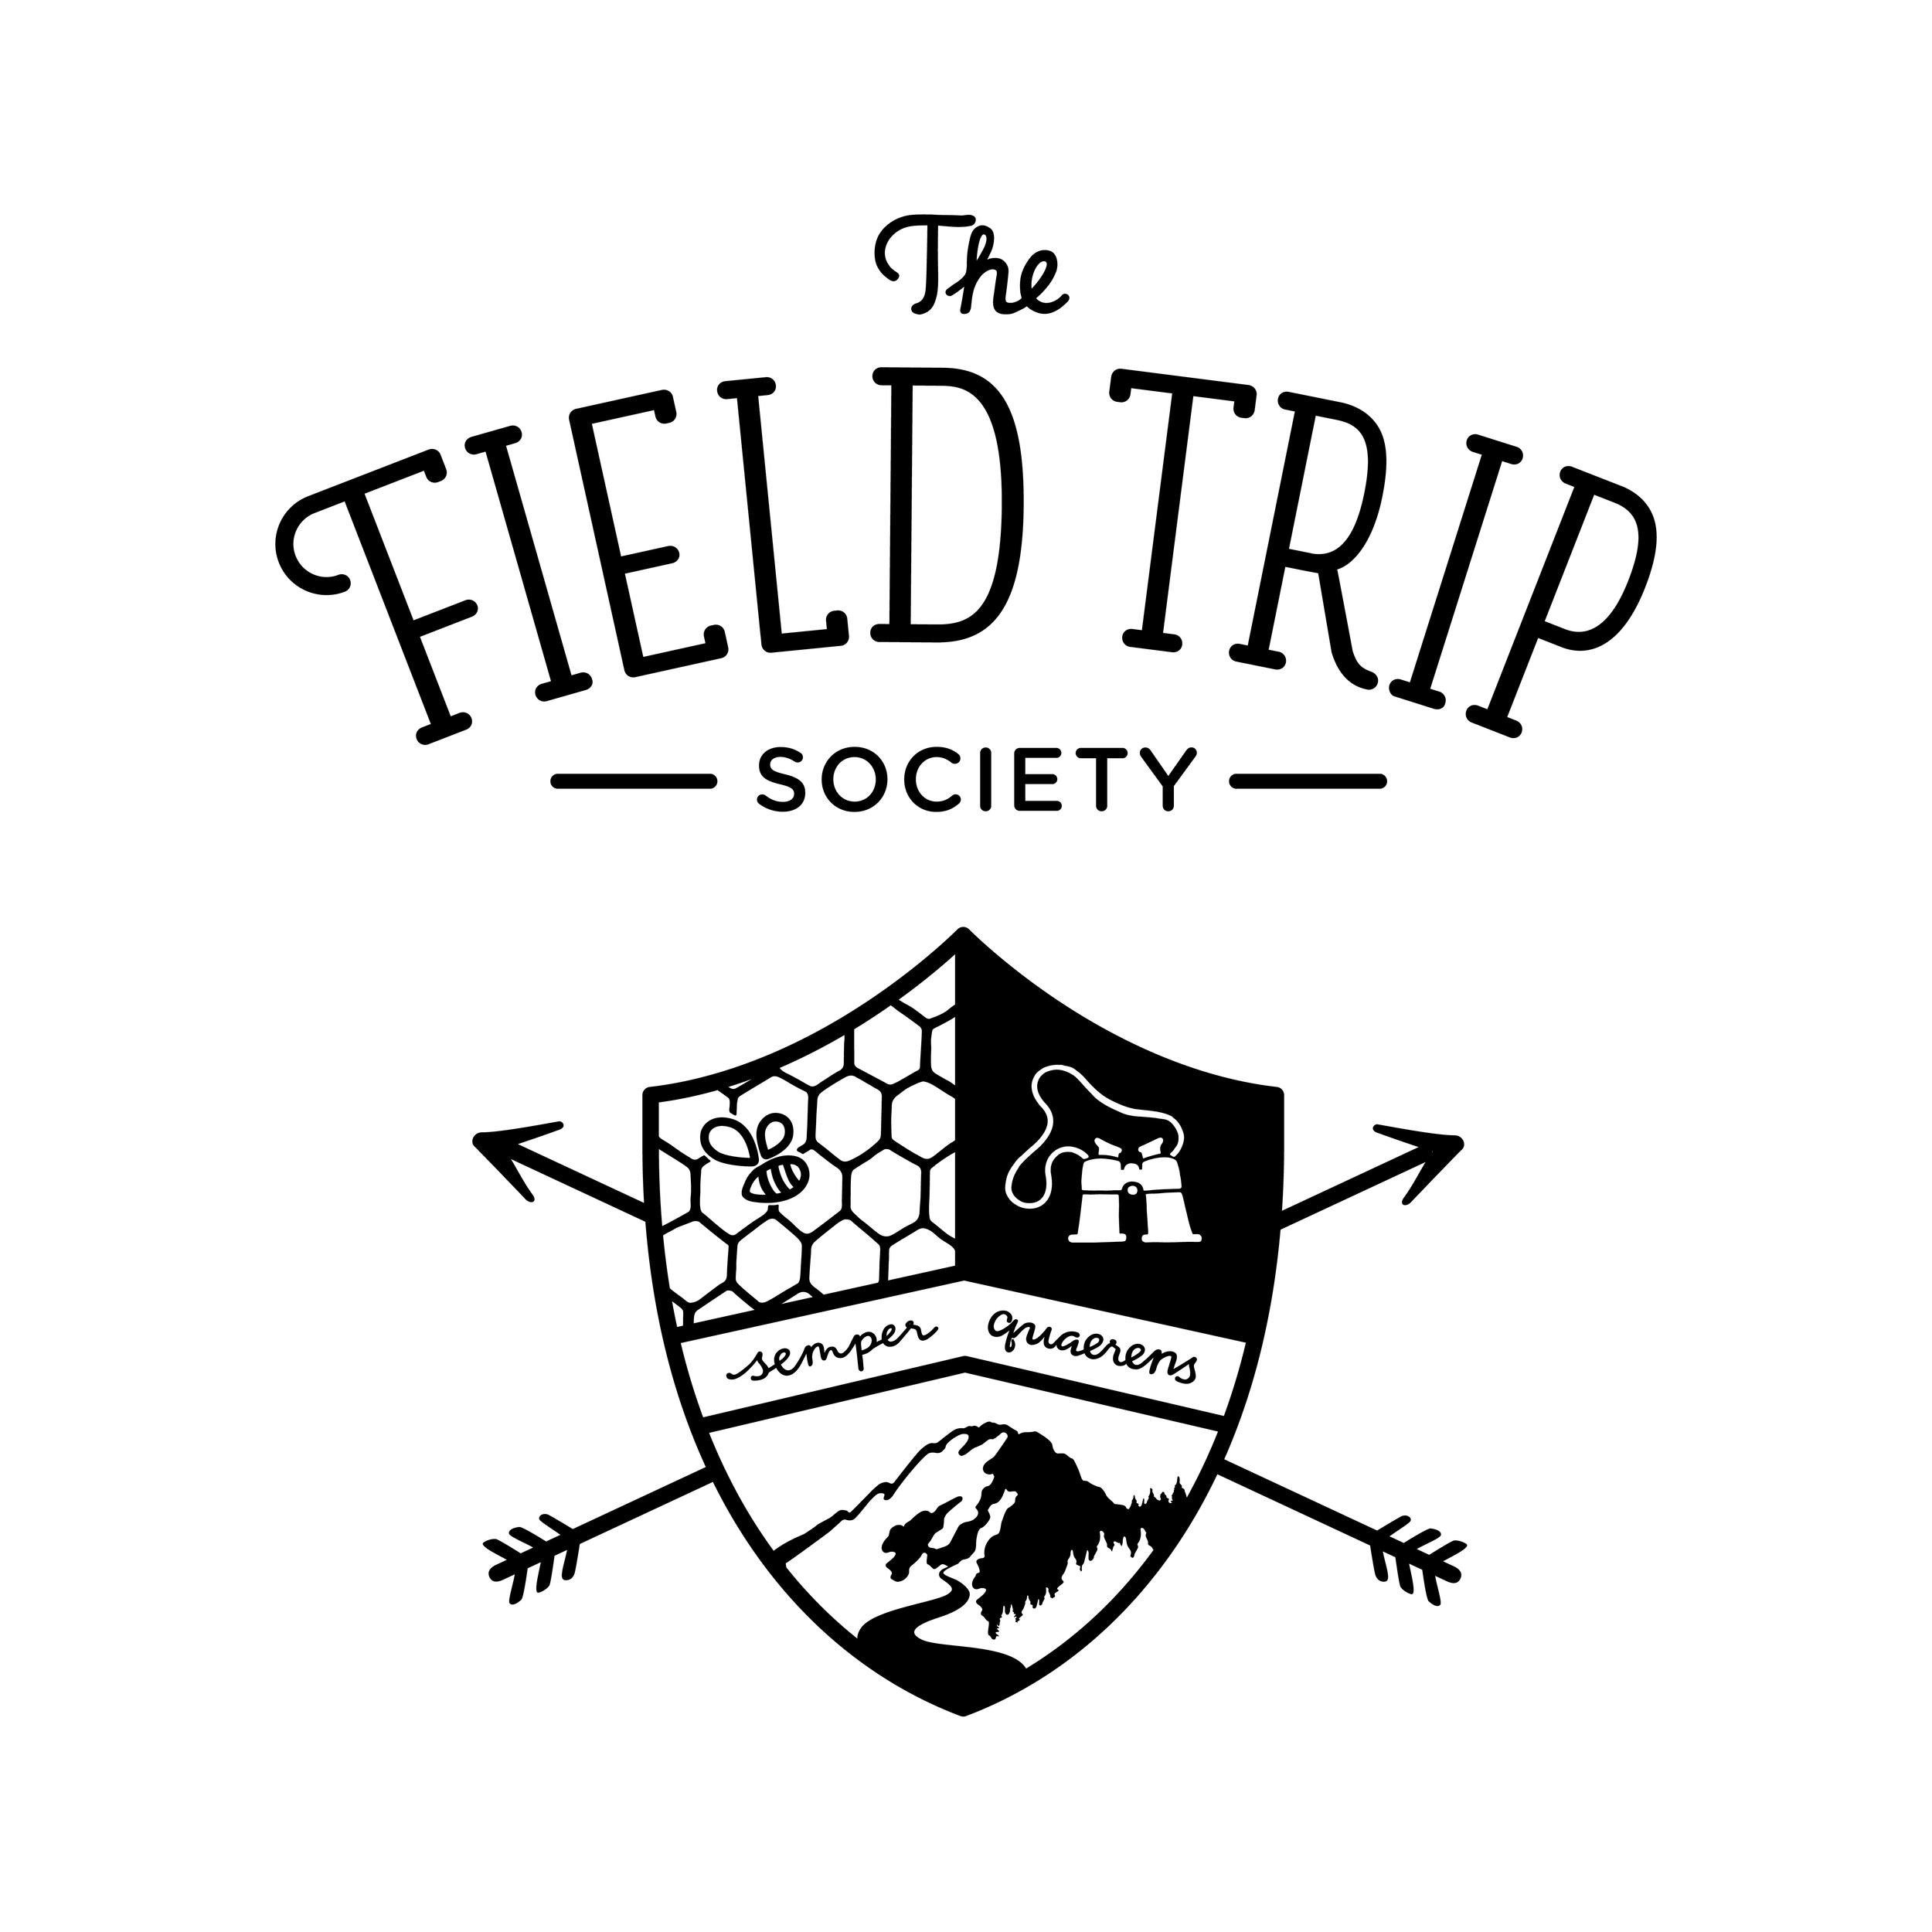 field trip society logo